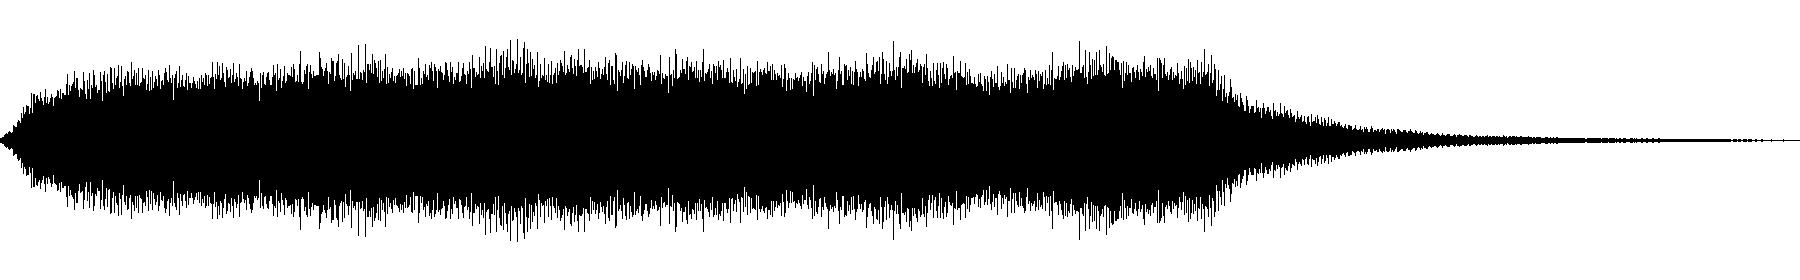 organ fm